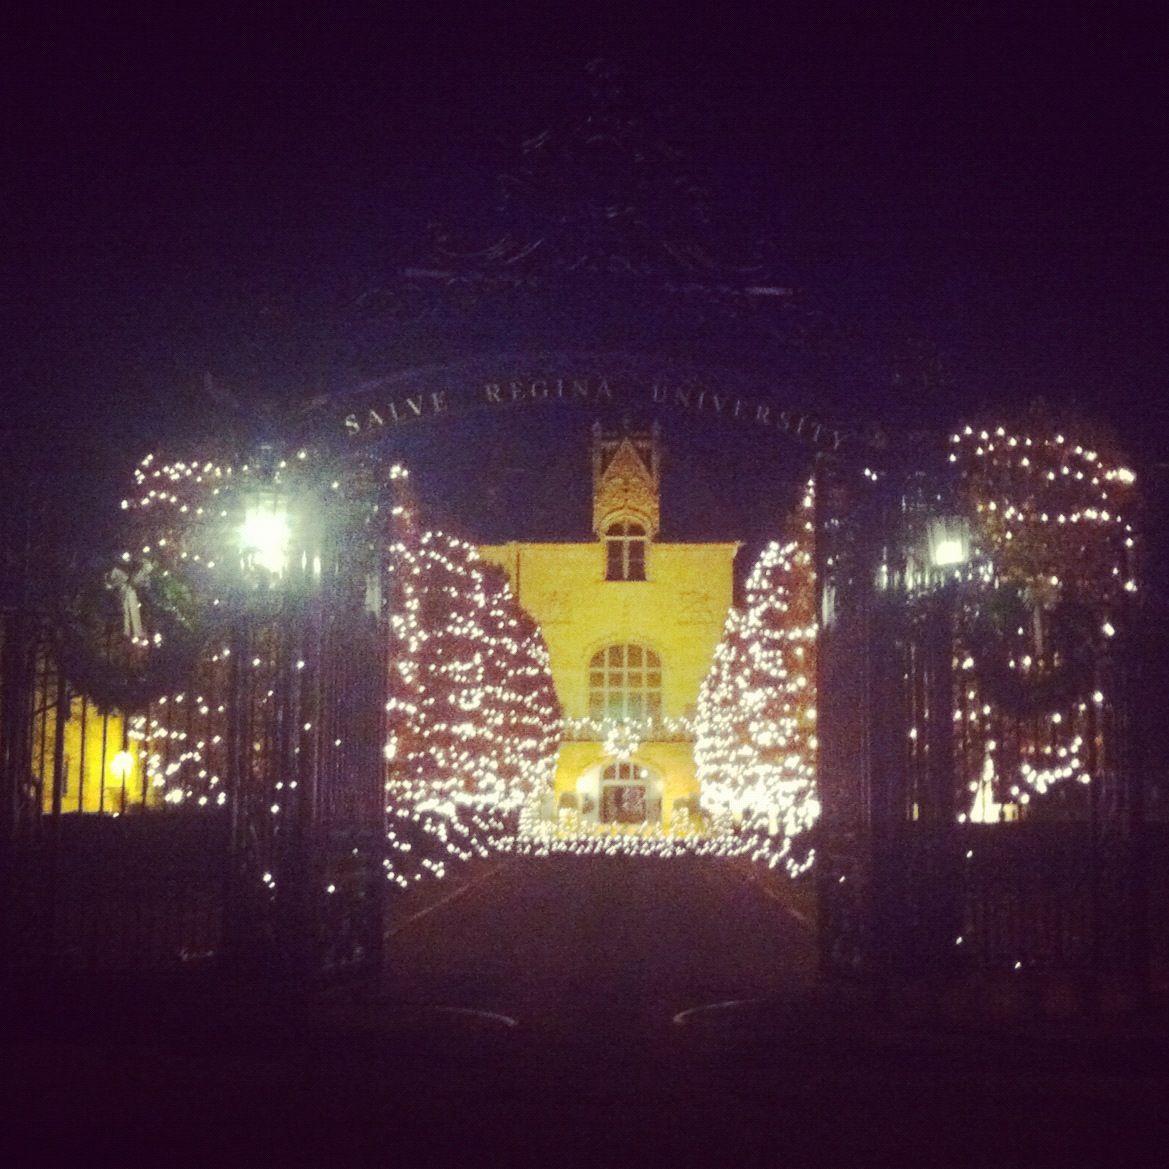 Best Christmas Decorations Long Island: Ochre Court At Salve Regina University During Christmas